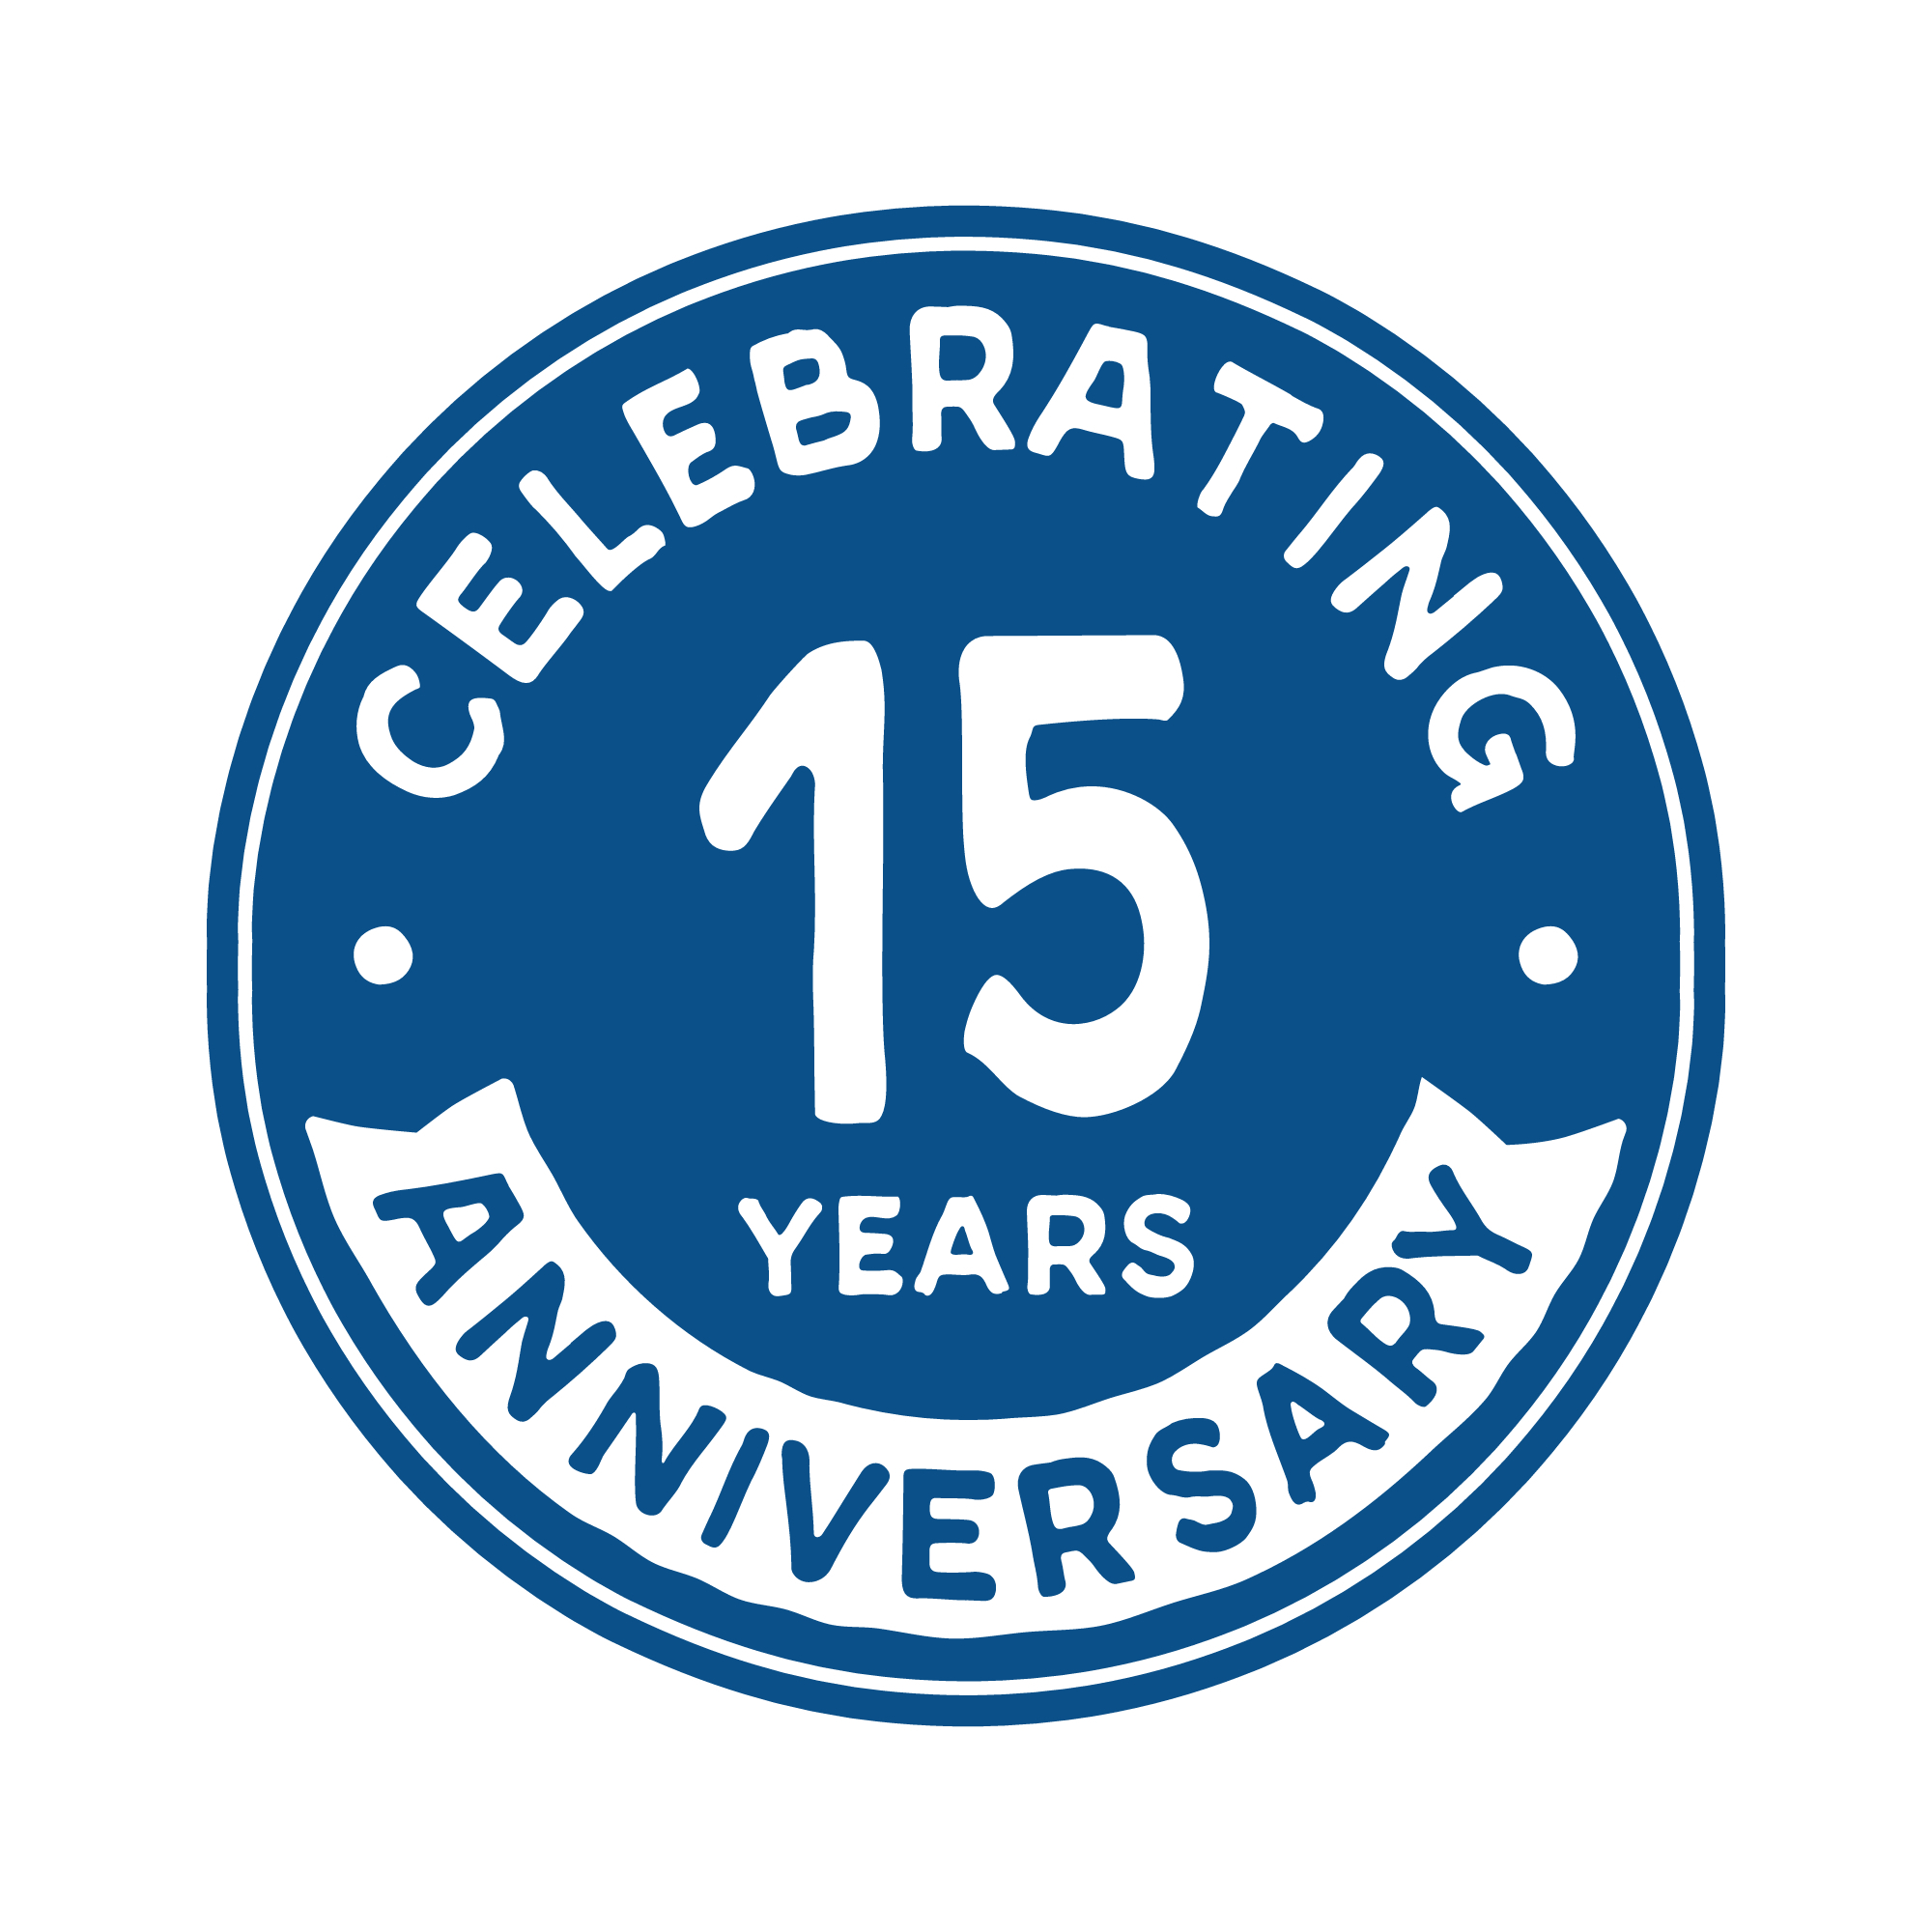 Ten Years of Unique Service